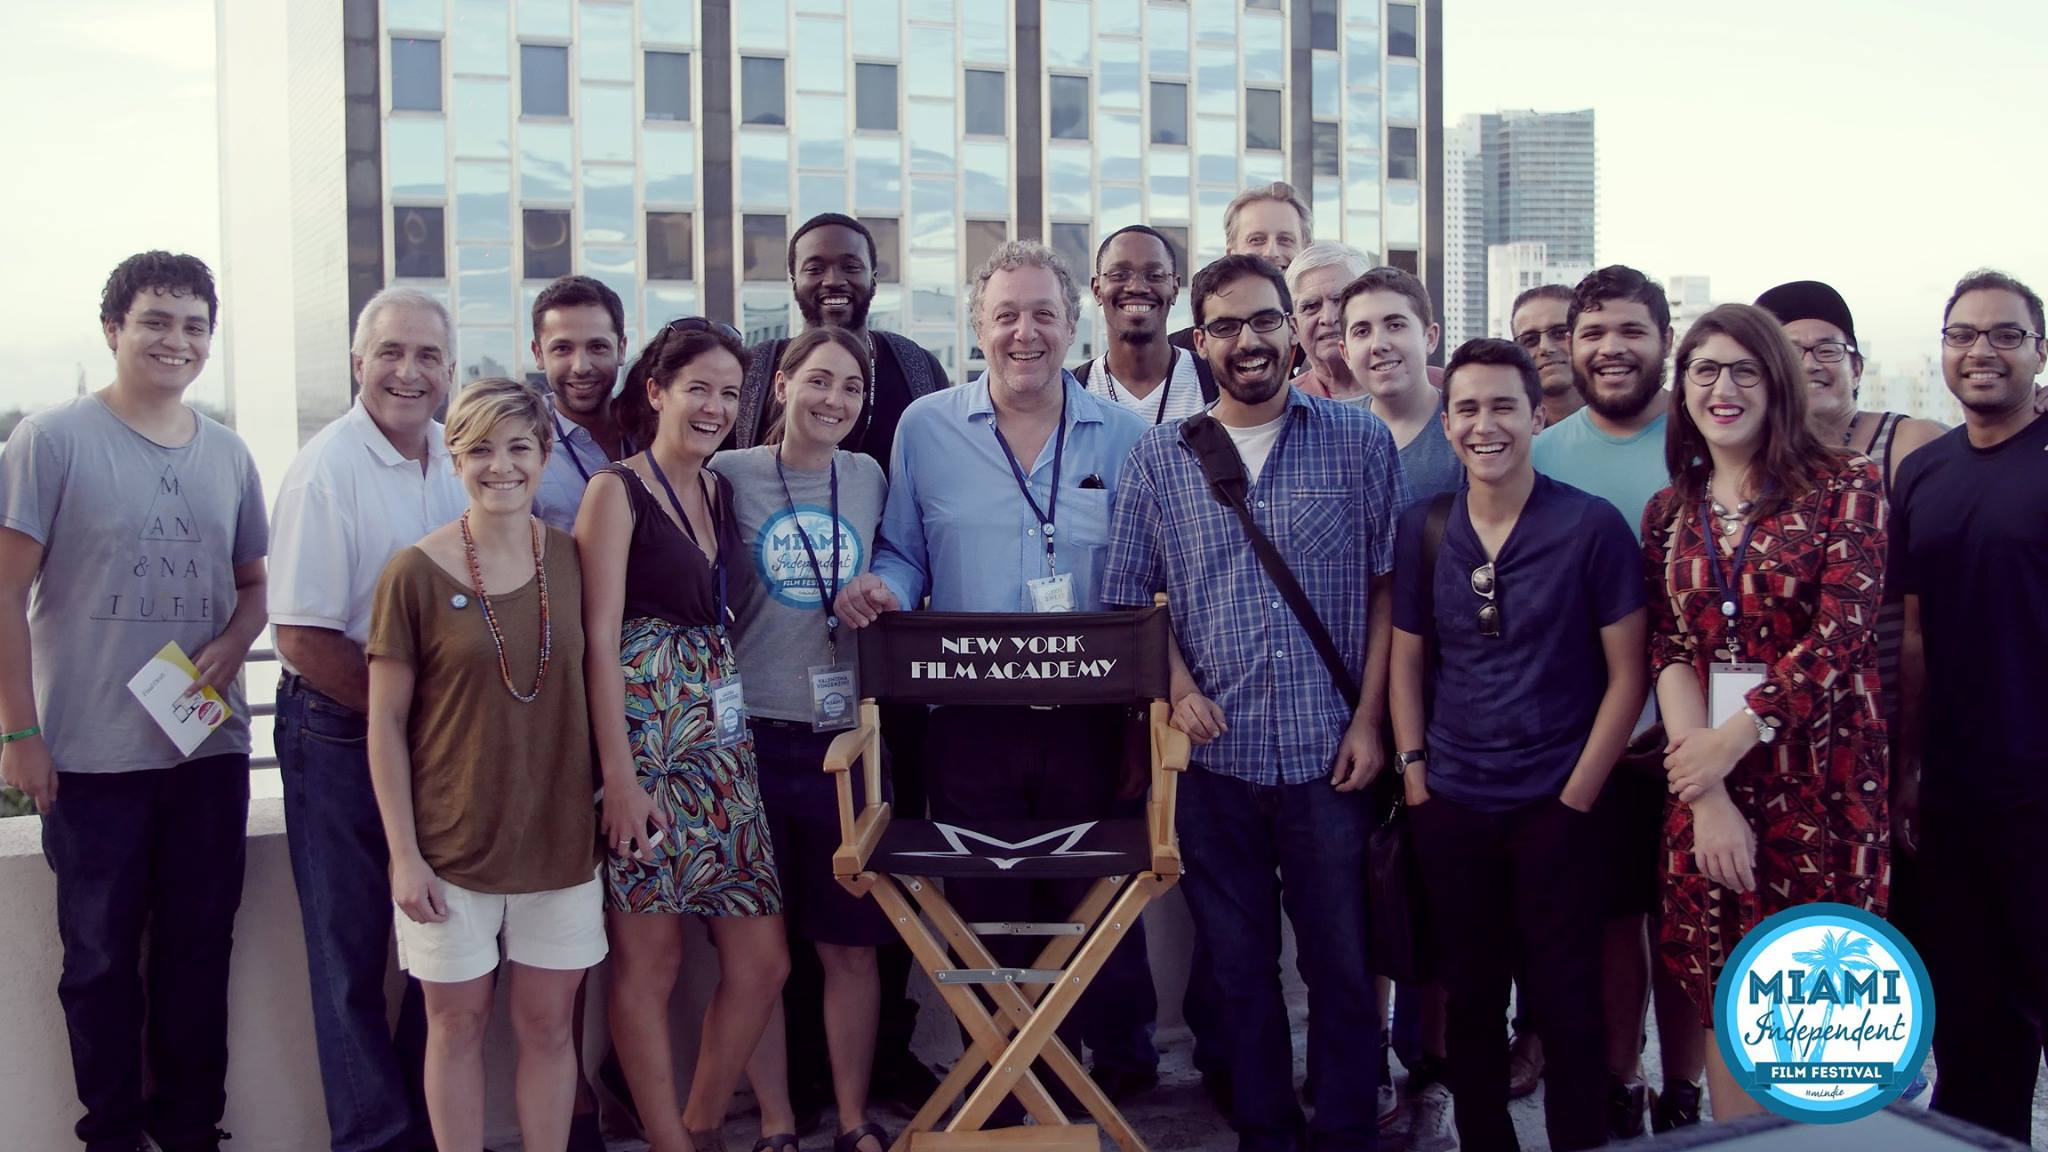 MINDIE2016-miami-independent-film-festival-workshop-alexis-sweet-nyfa-new-york-film-academy